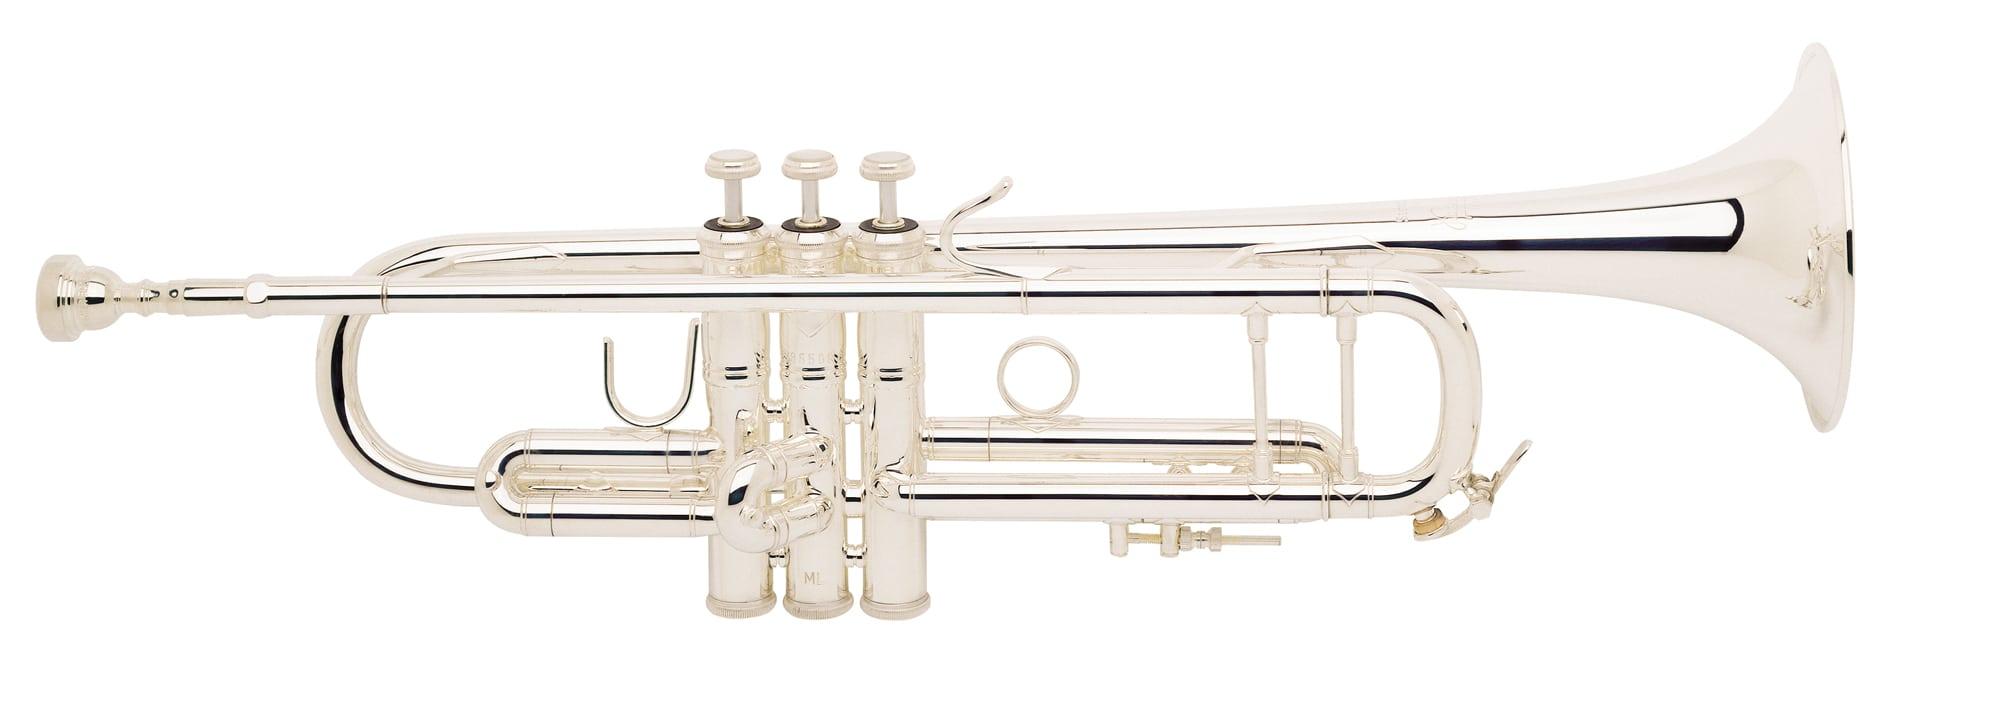 Trompeten - Bach 180S 43 ML Stradivarius Bb Trompete versilbert - Onlineshop Musikhaus Kirstein